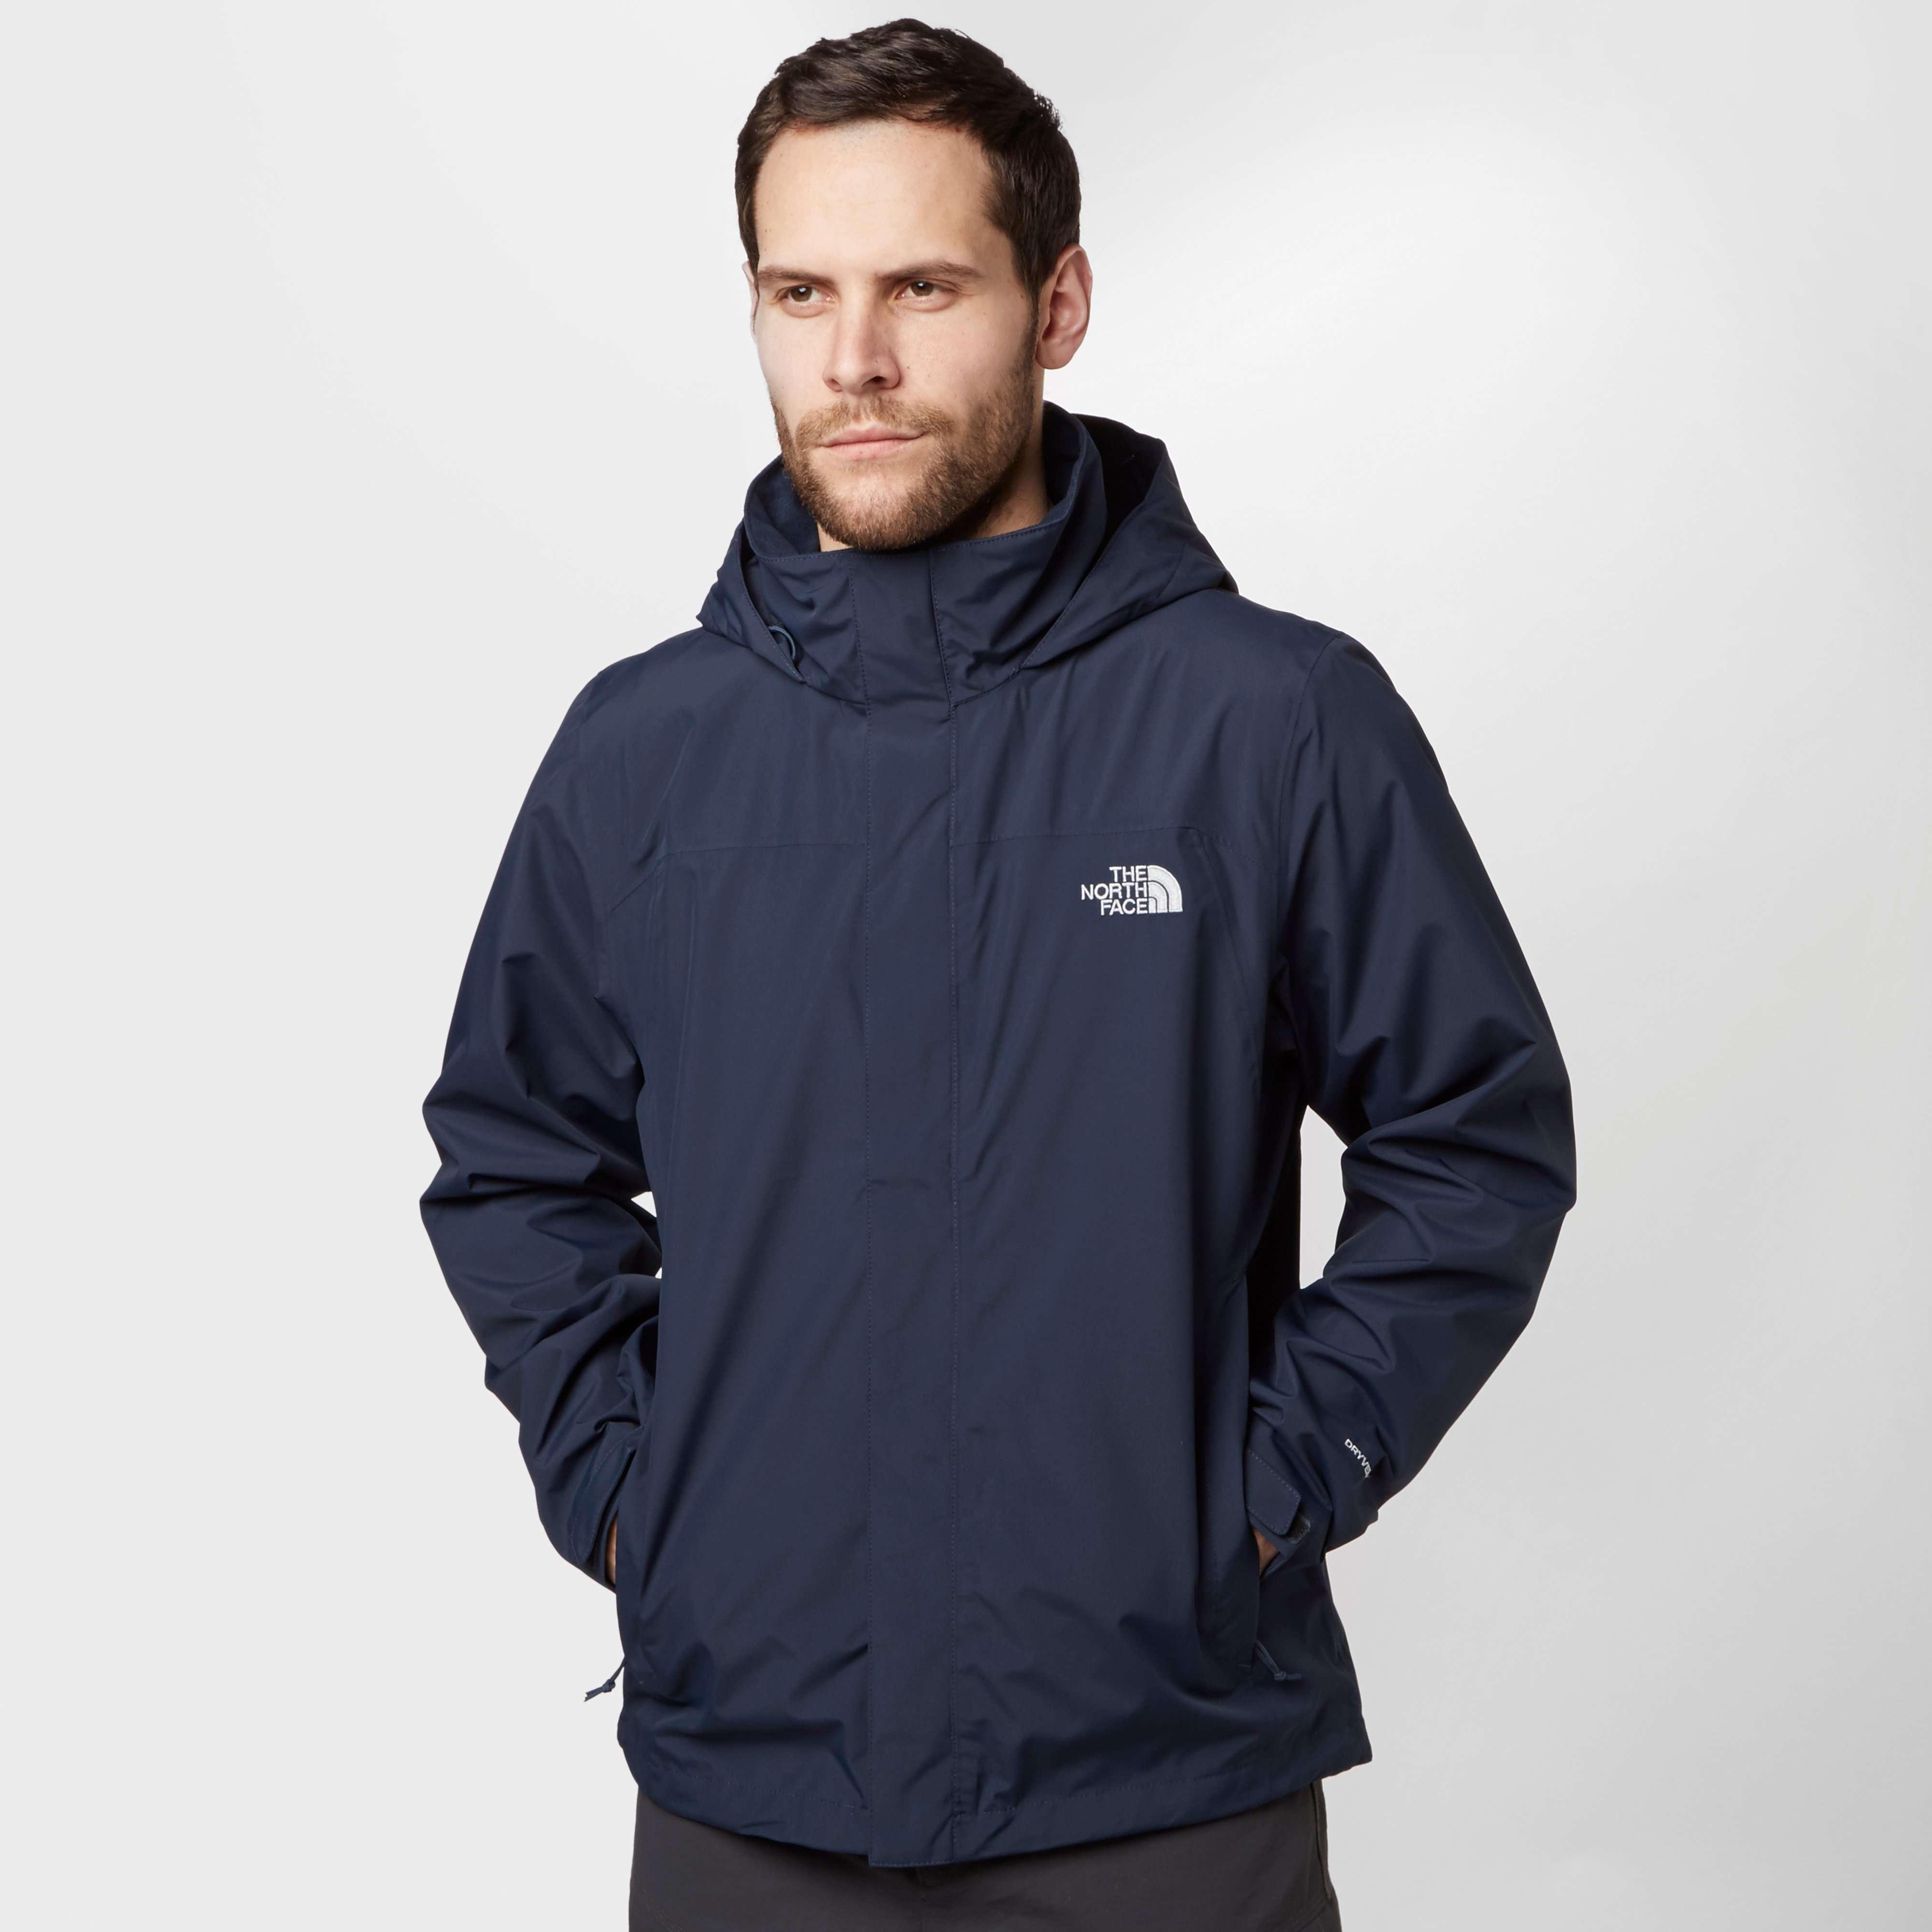 THE NORTH FACE Men's Sangro Waterproof Jacket